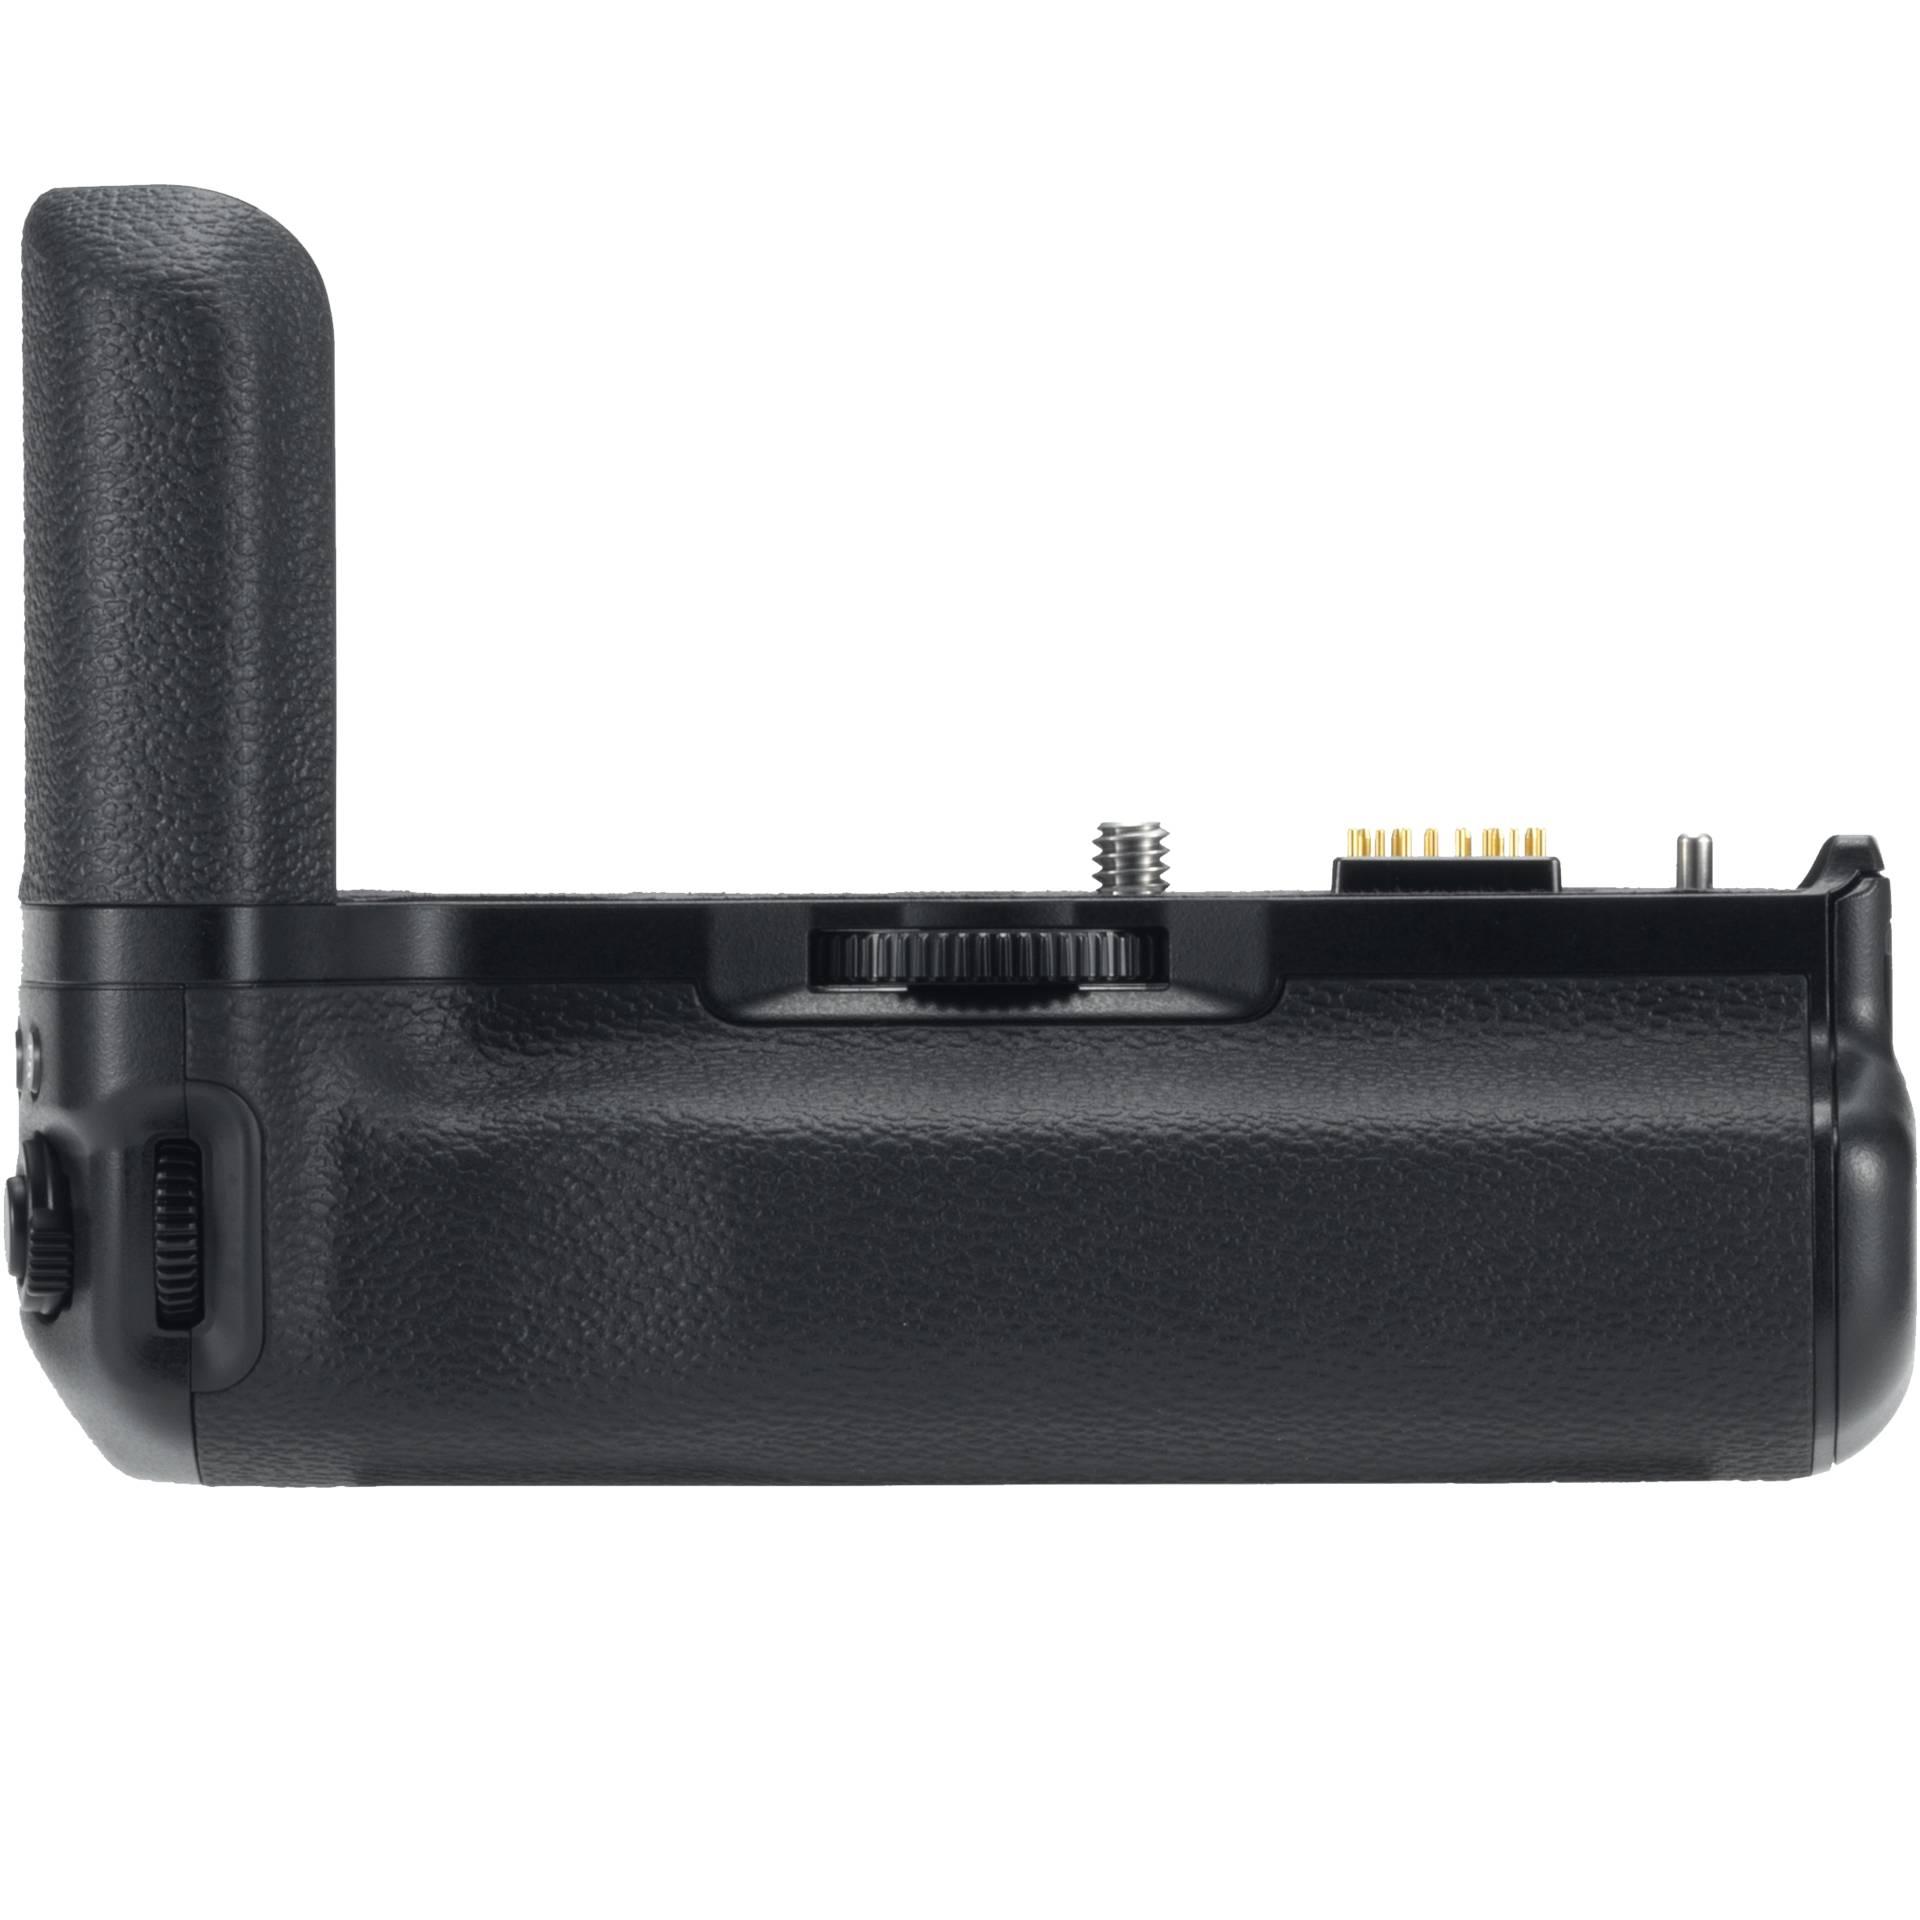 Fujifilm VG-XT3 Batteriehandgriff